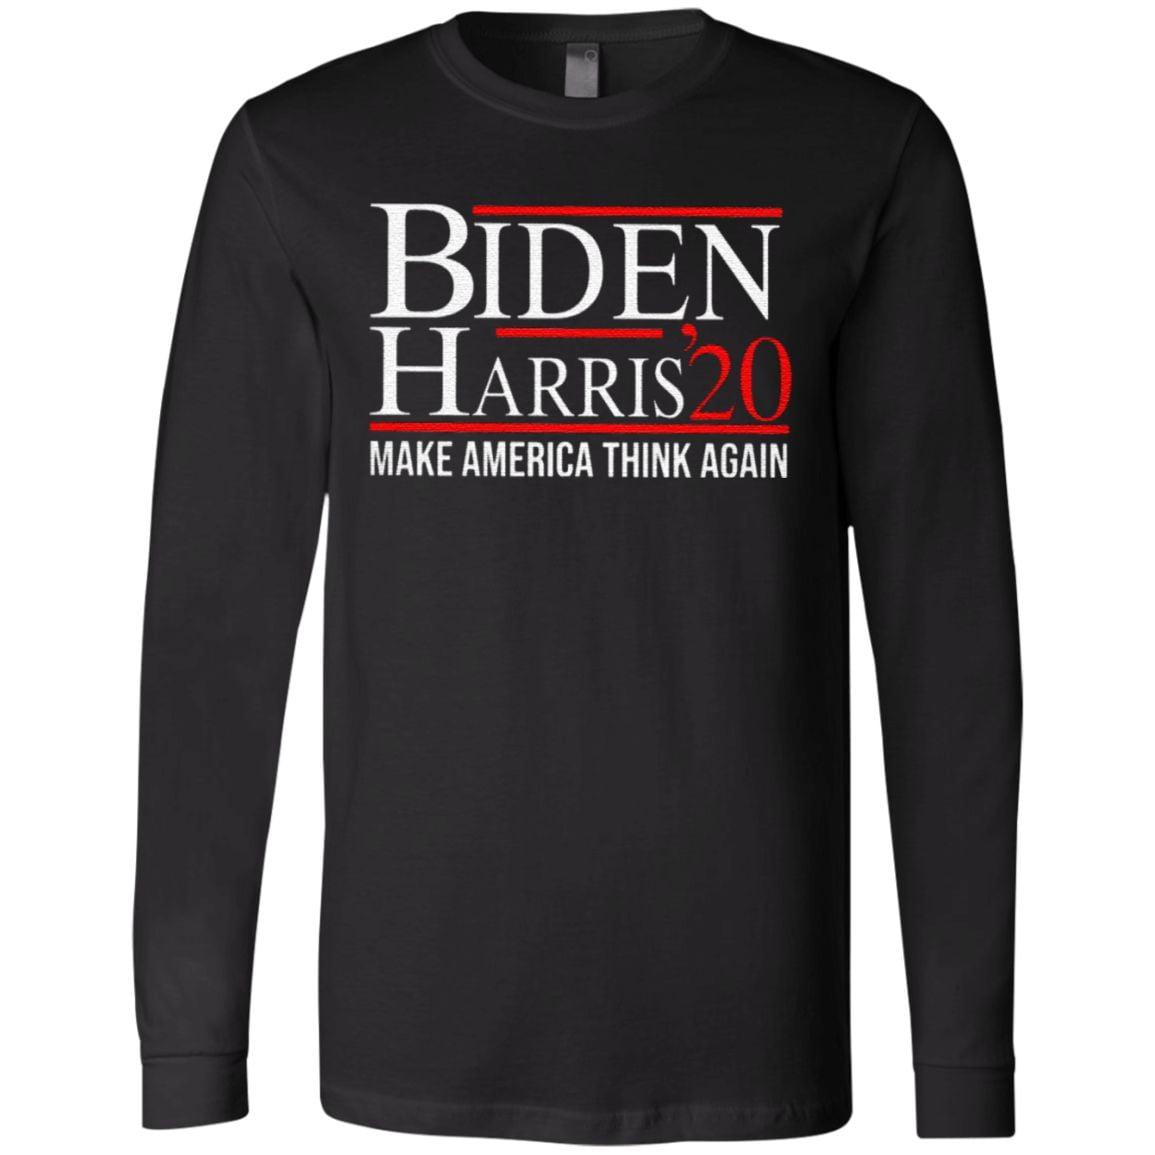 Biden Harris 2020 Make America Think Again T Shirt